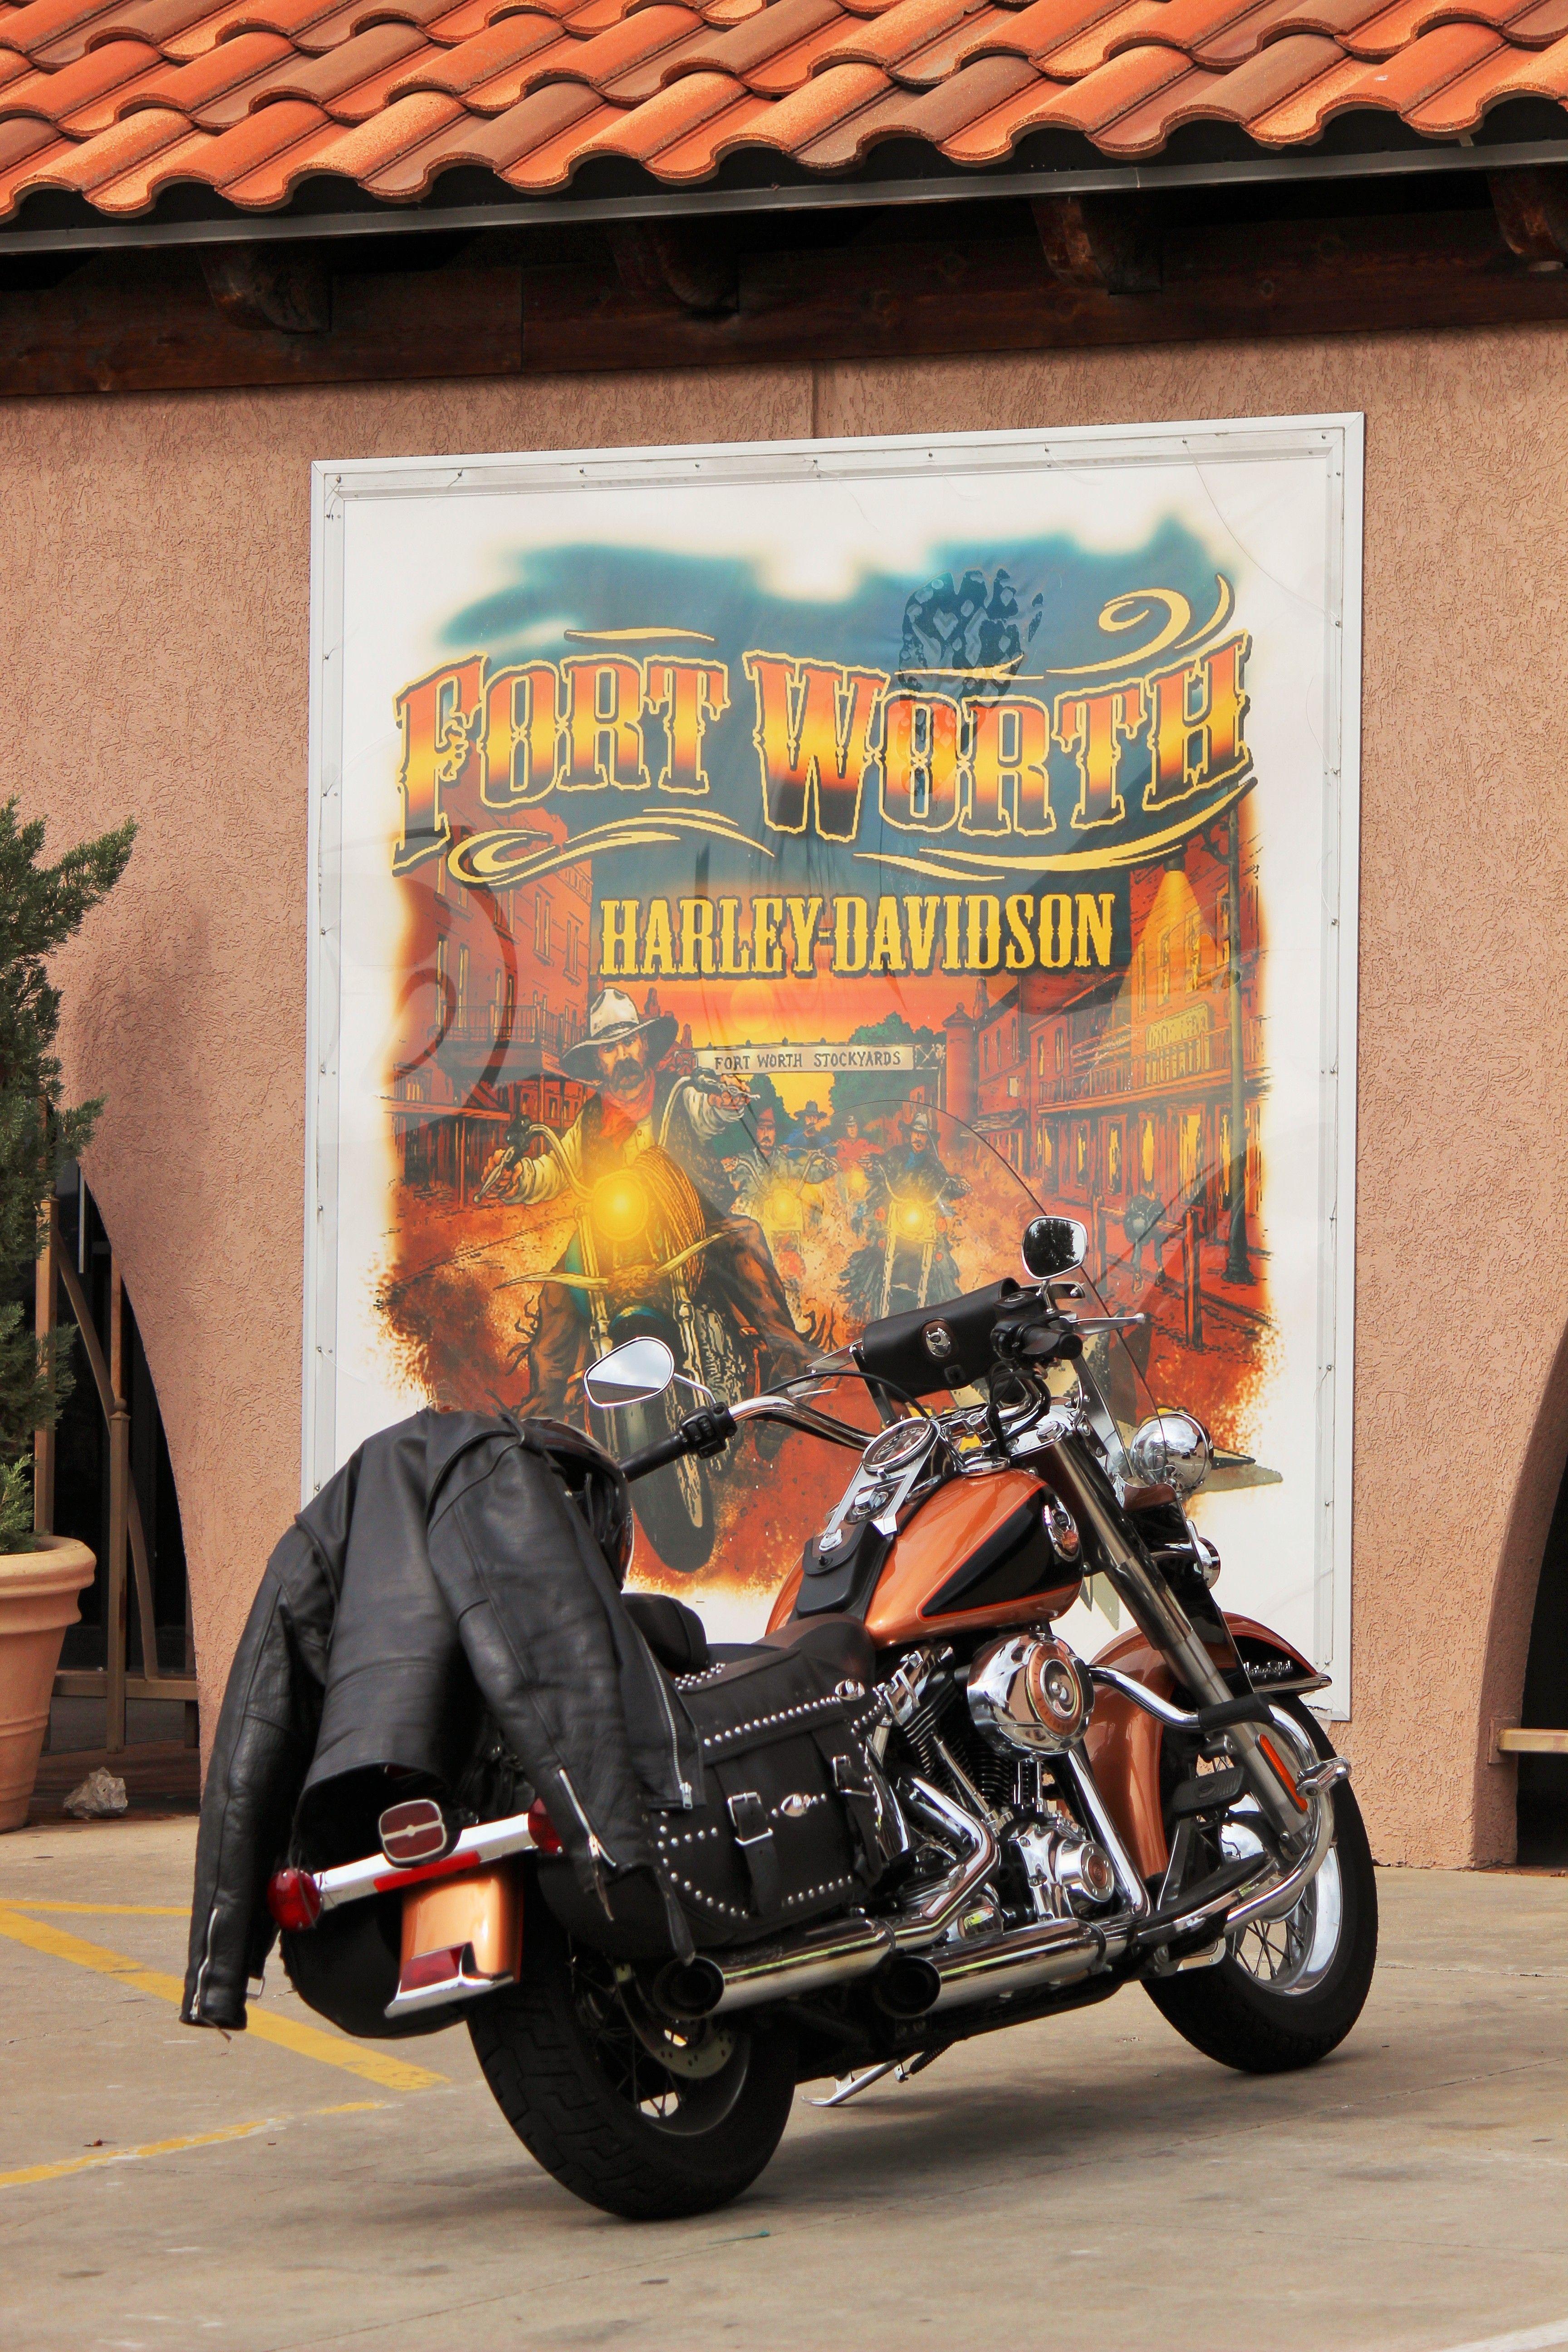 Fort worth Harley Davidson Harley Davidson Pinterest